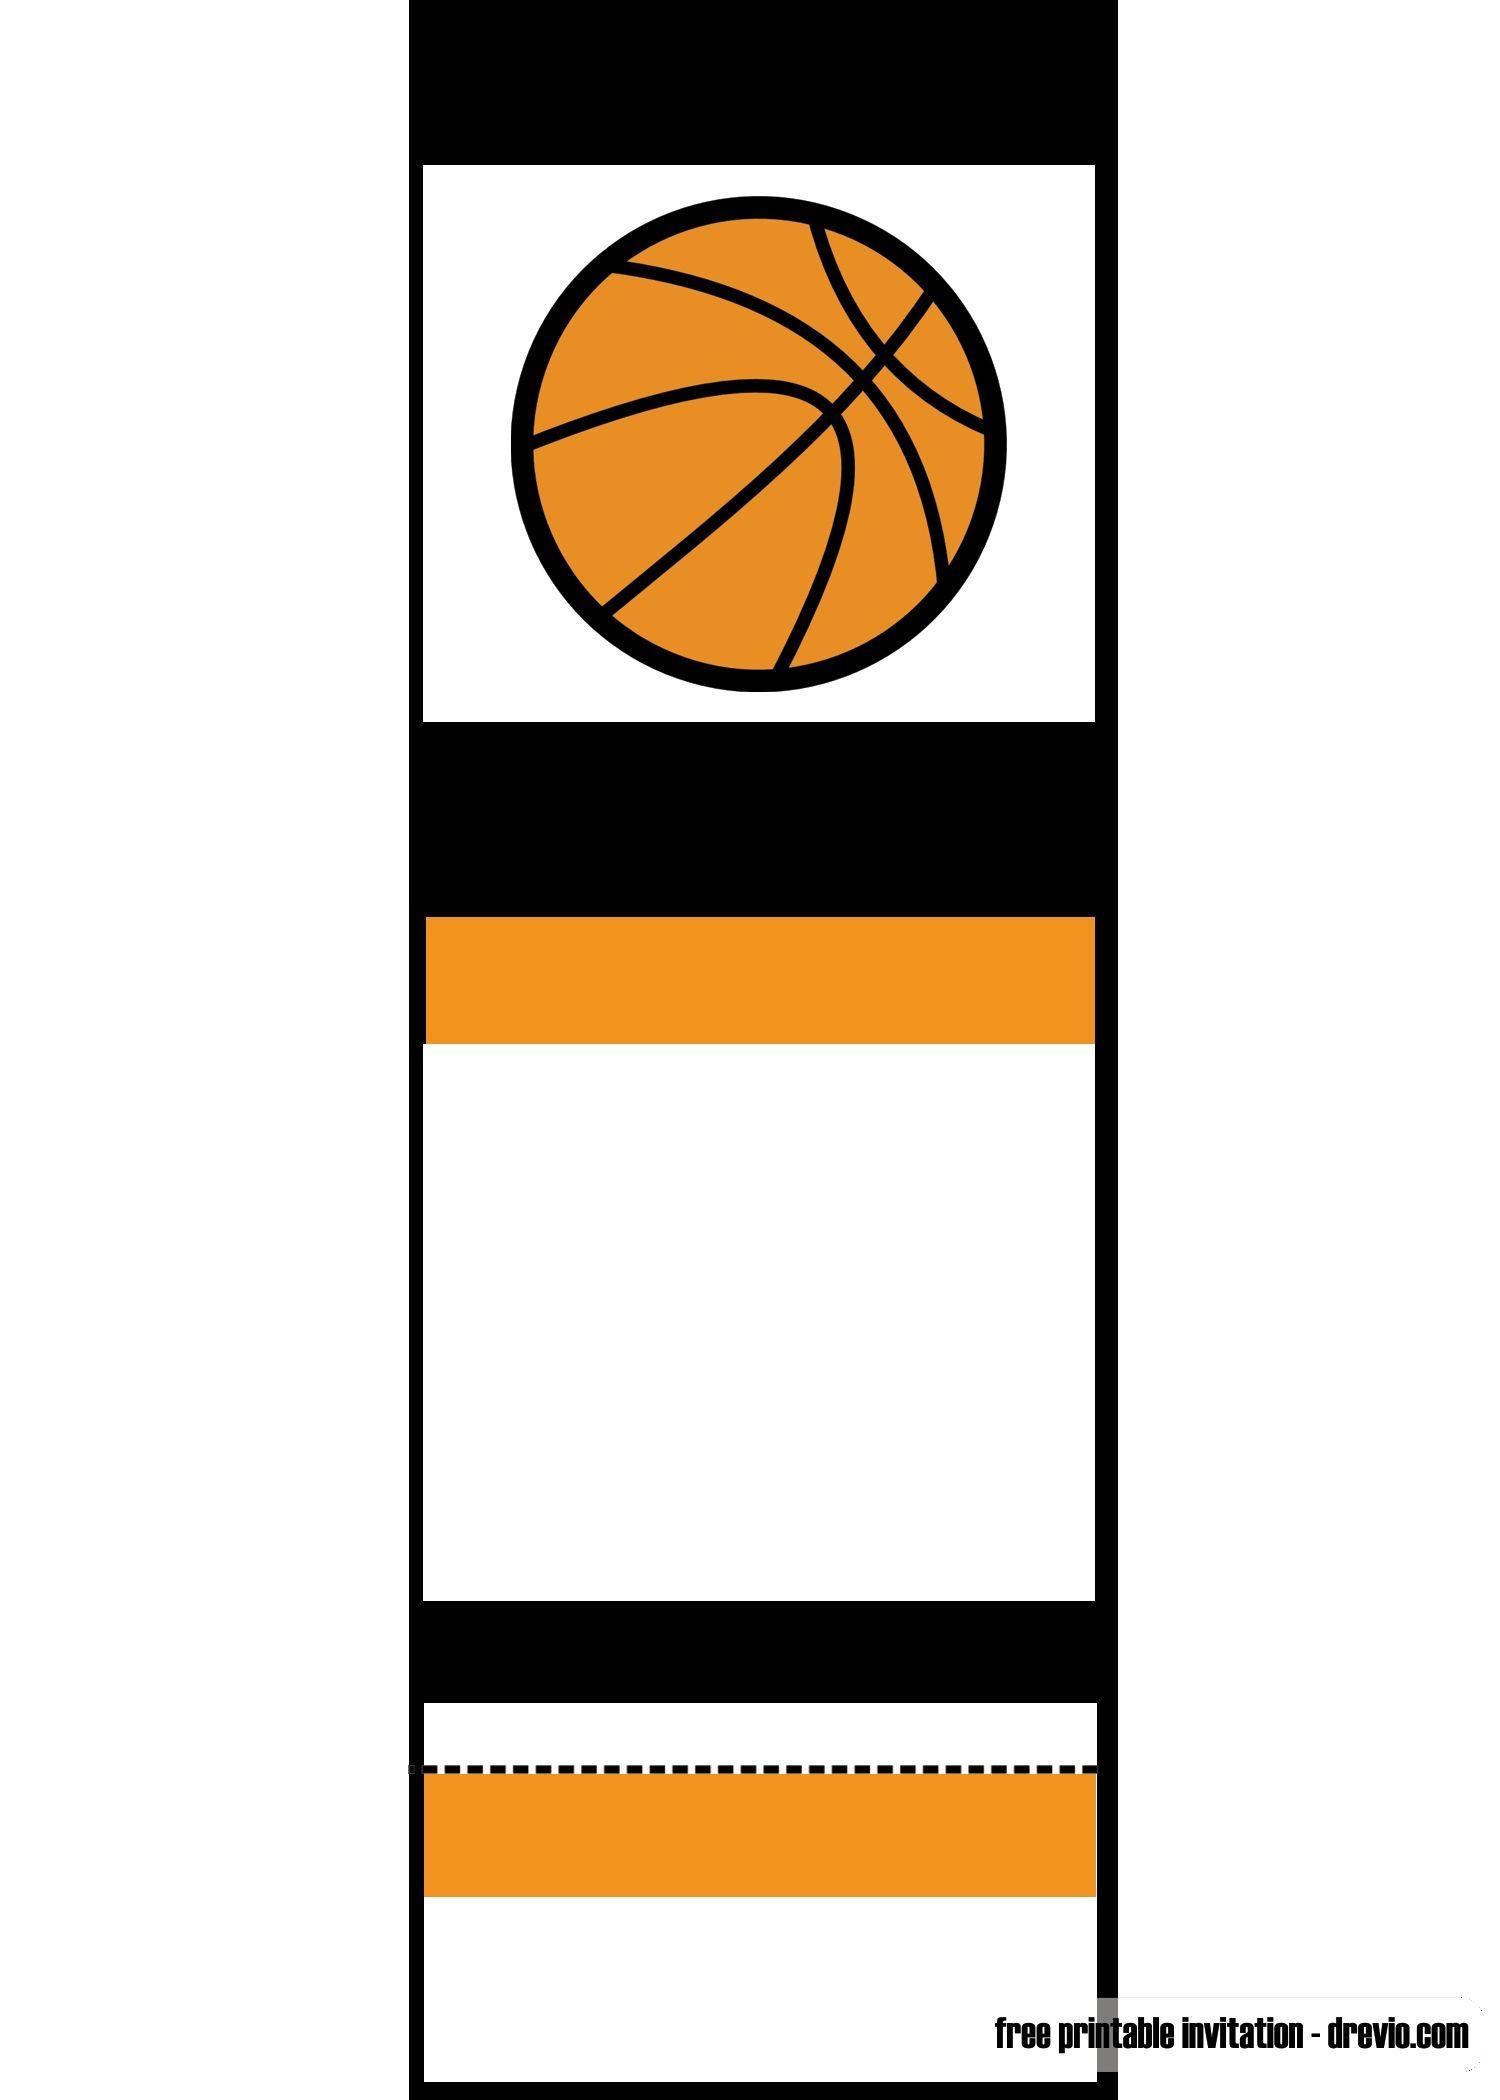 Free Printable Basketball Ticket Invitation | Unc Vs Gonzaga - Basketball Invites Free Printable